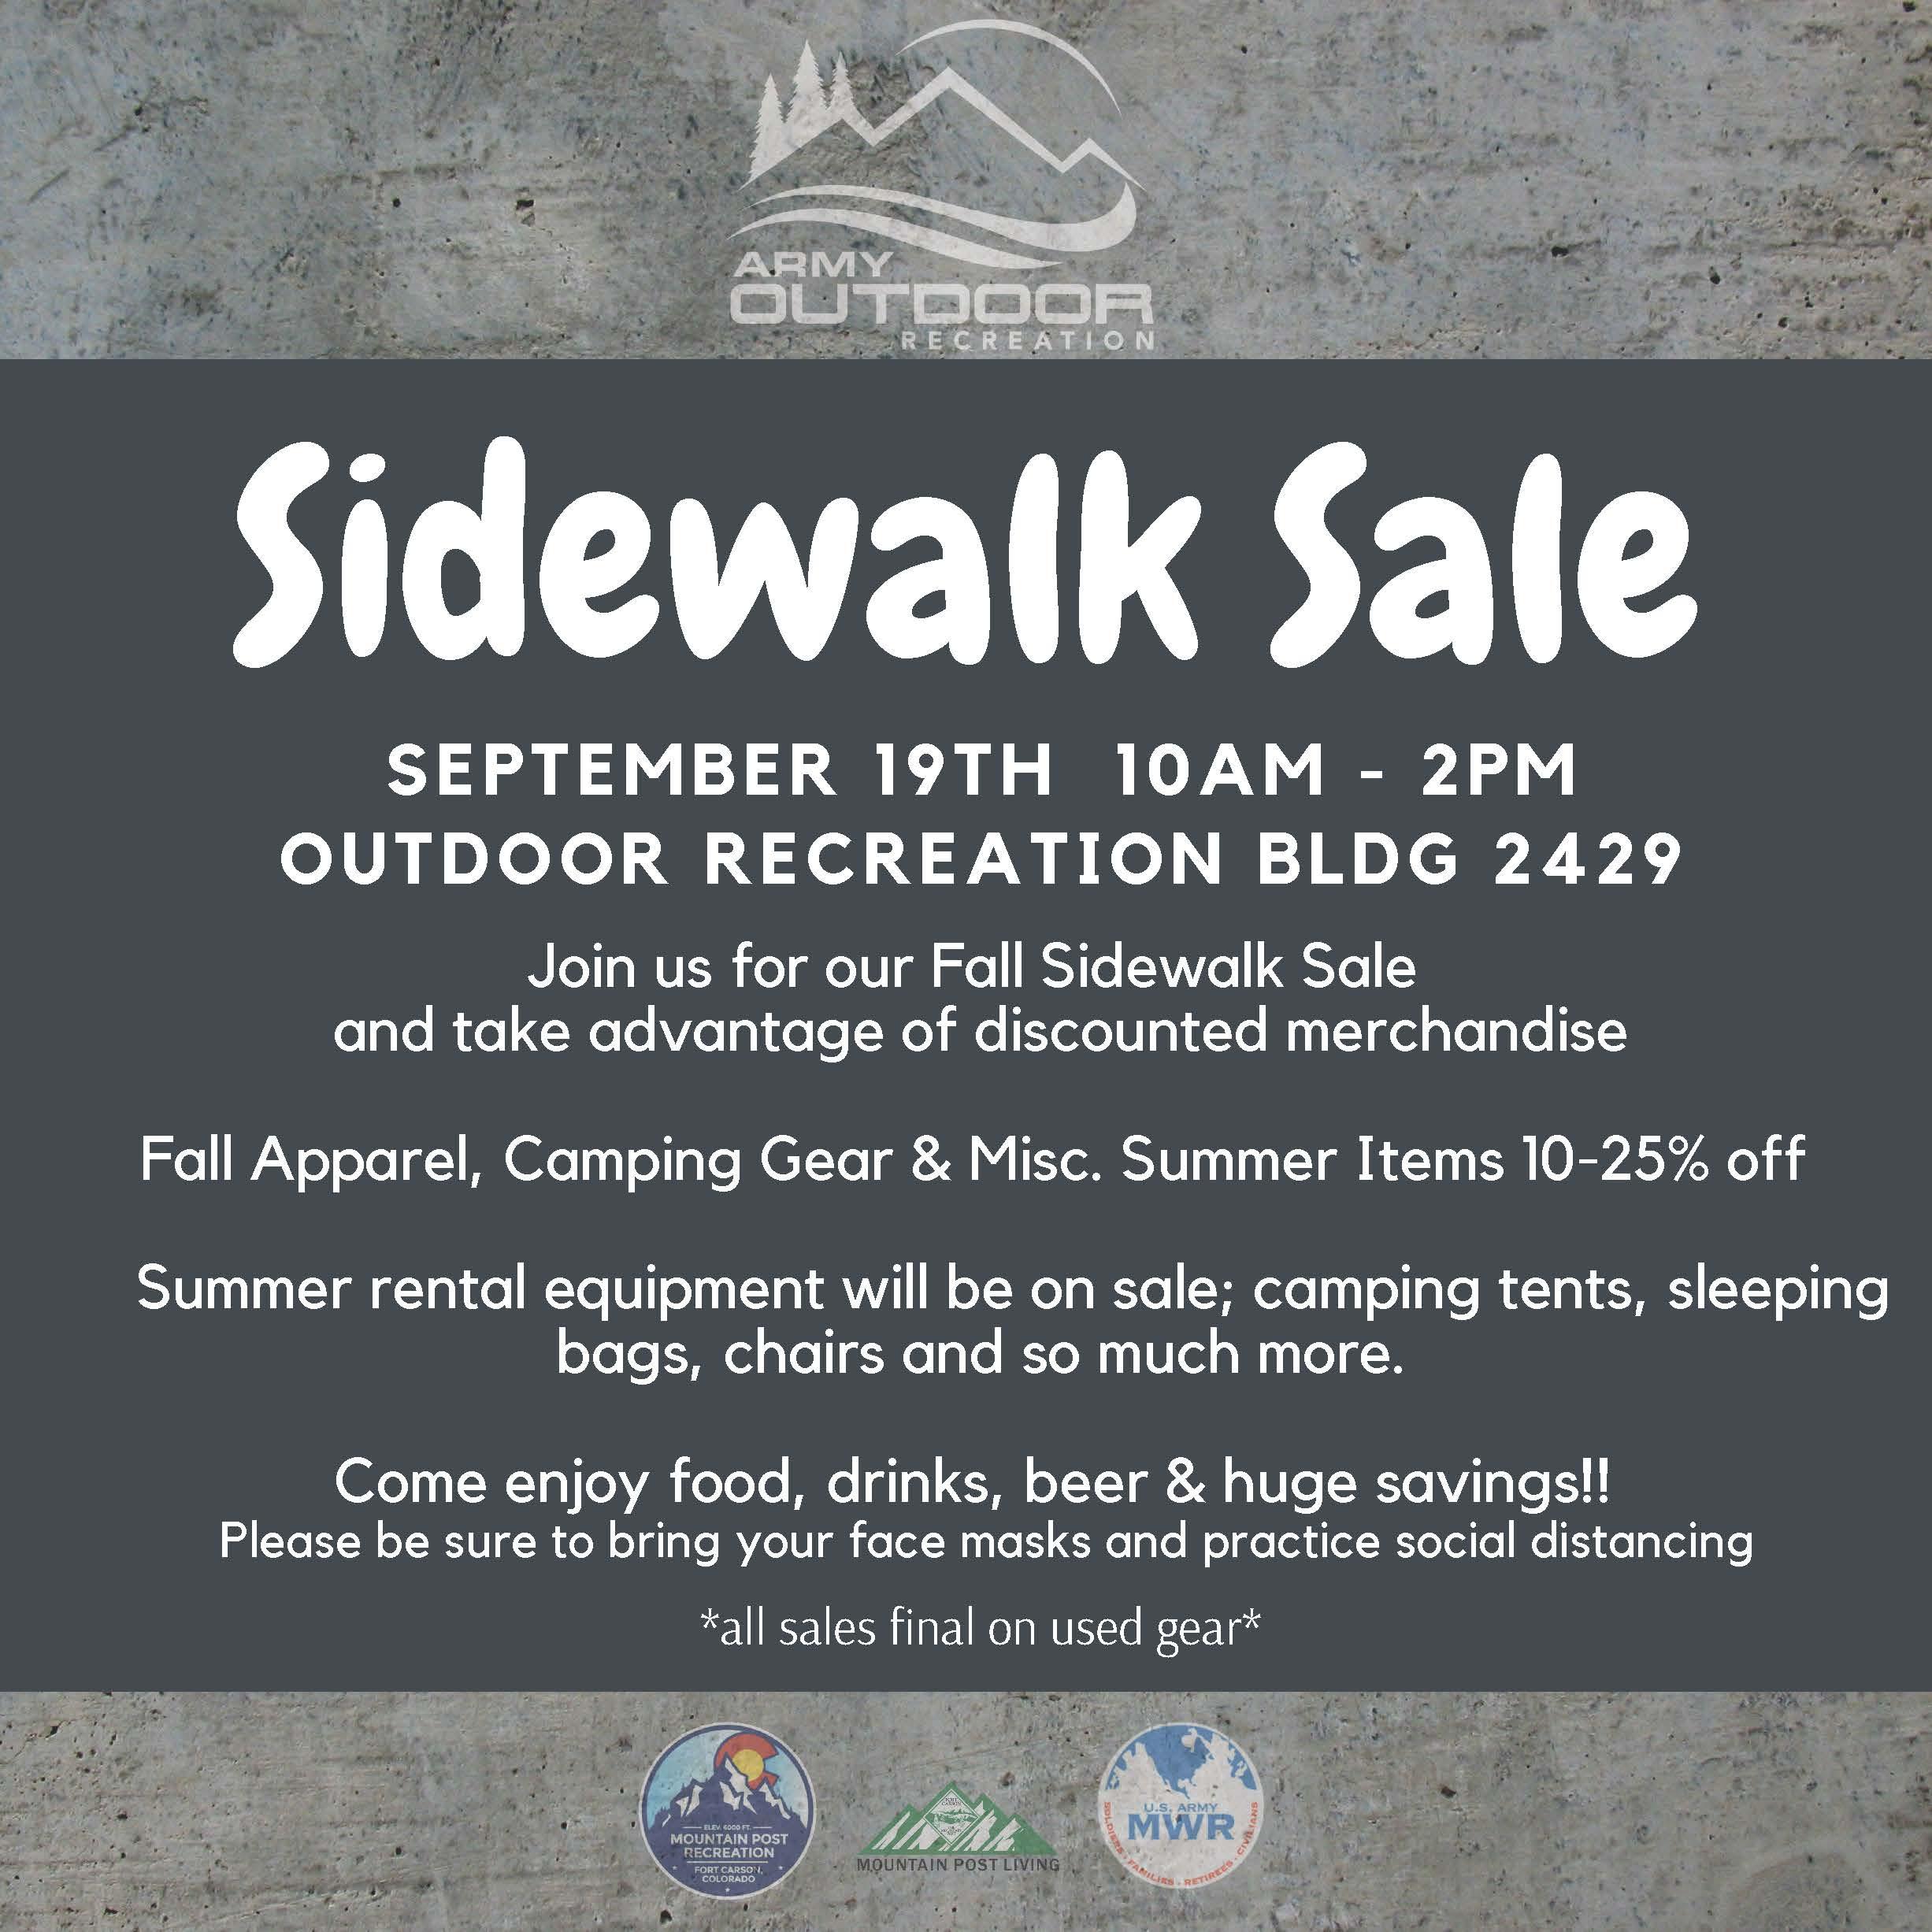 Fort Carson Sidewalk Sale.jpg